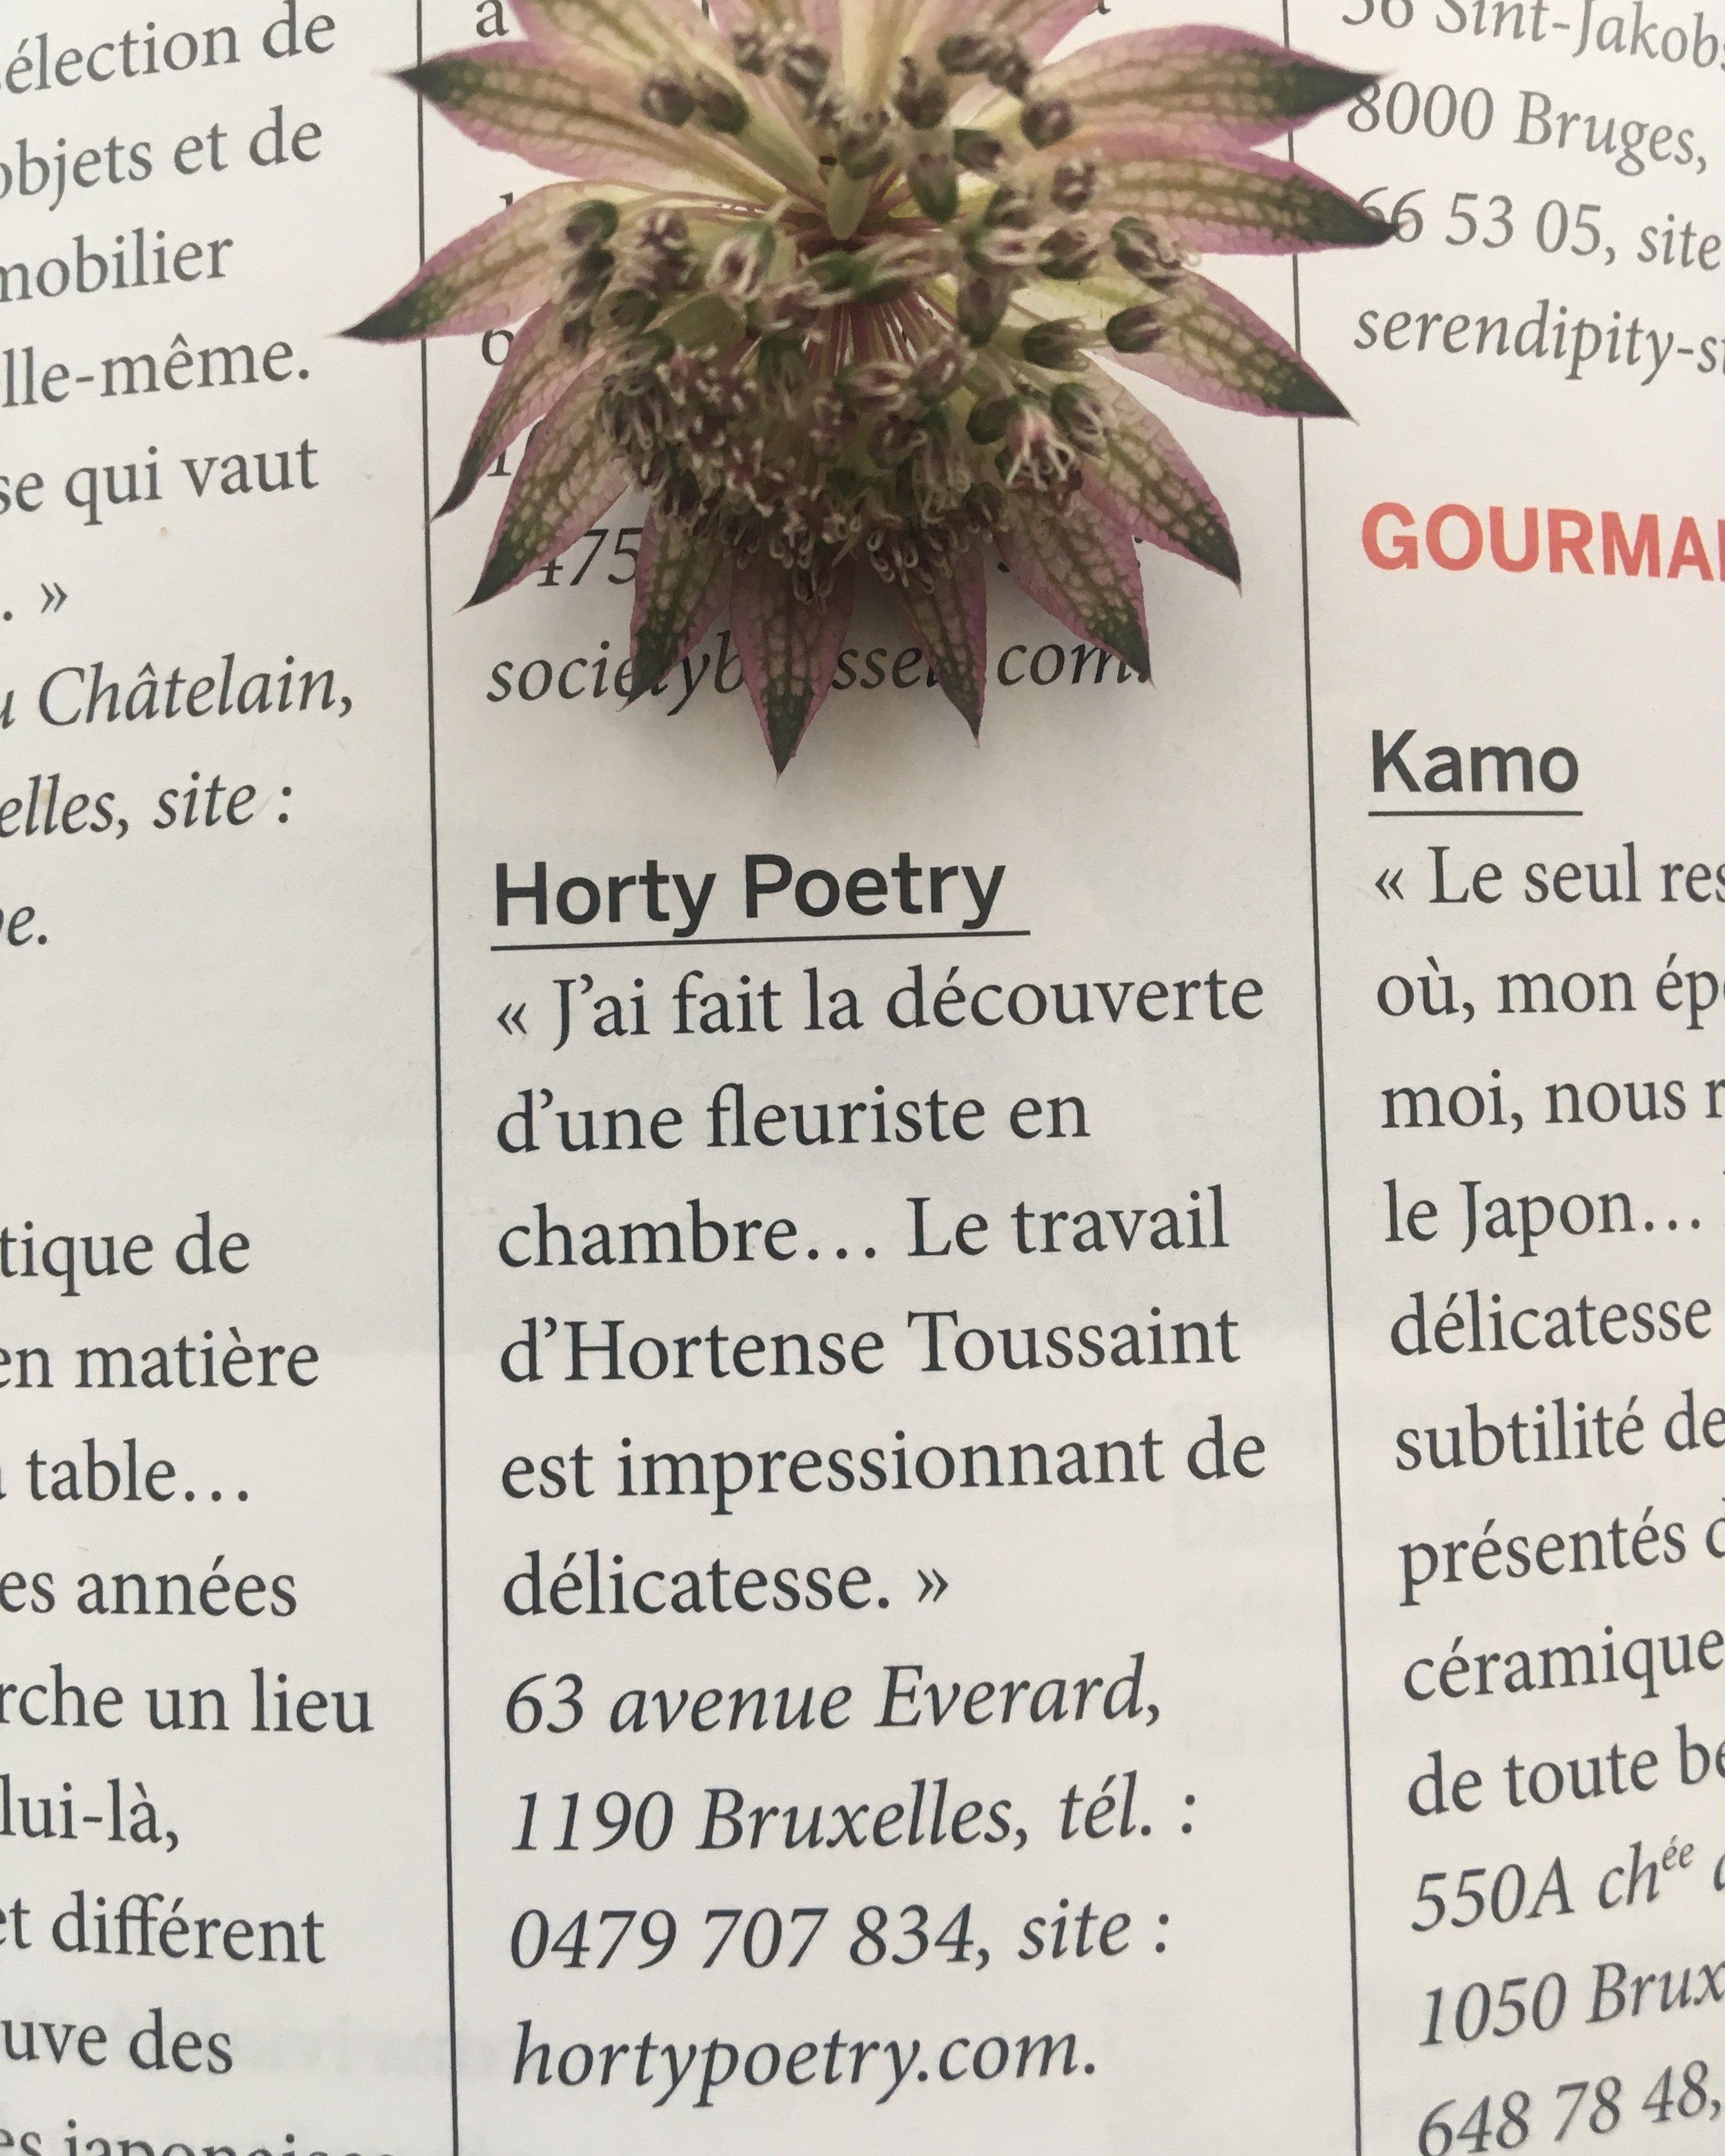 j&vmagazine 05|2019 - L' Art de Vivre franco-belge | Les bonnes adresses d'I. Yamamoto by Agnès Zamboni | www.jvmagazine.be